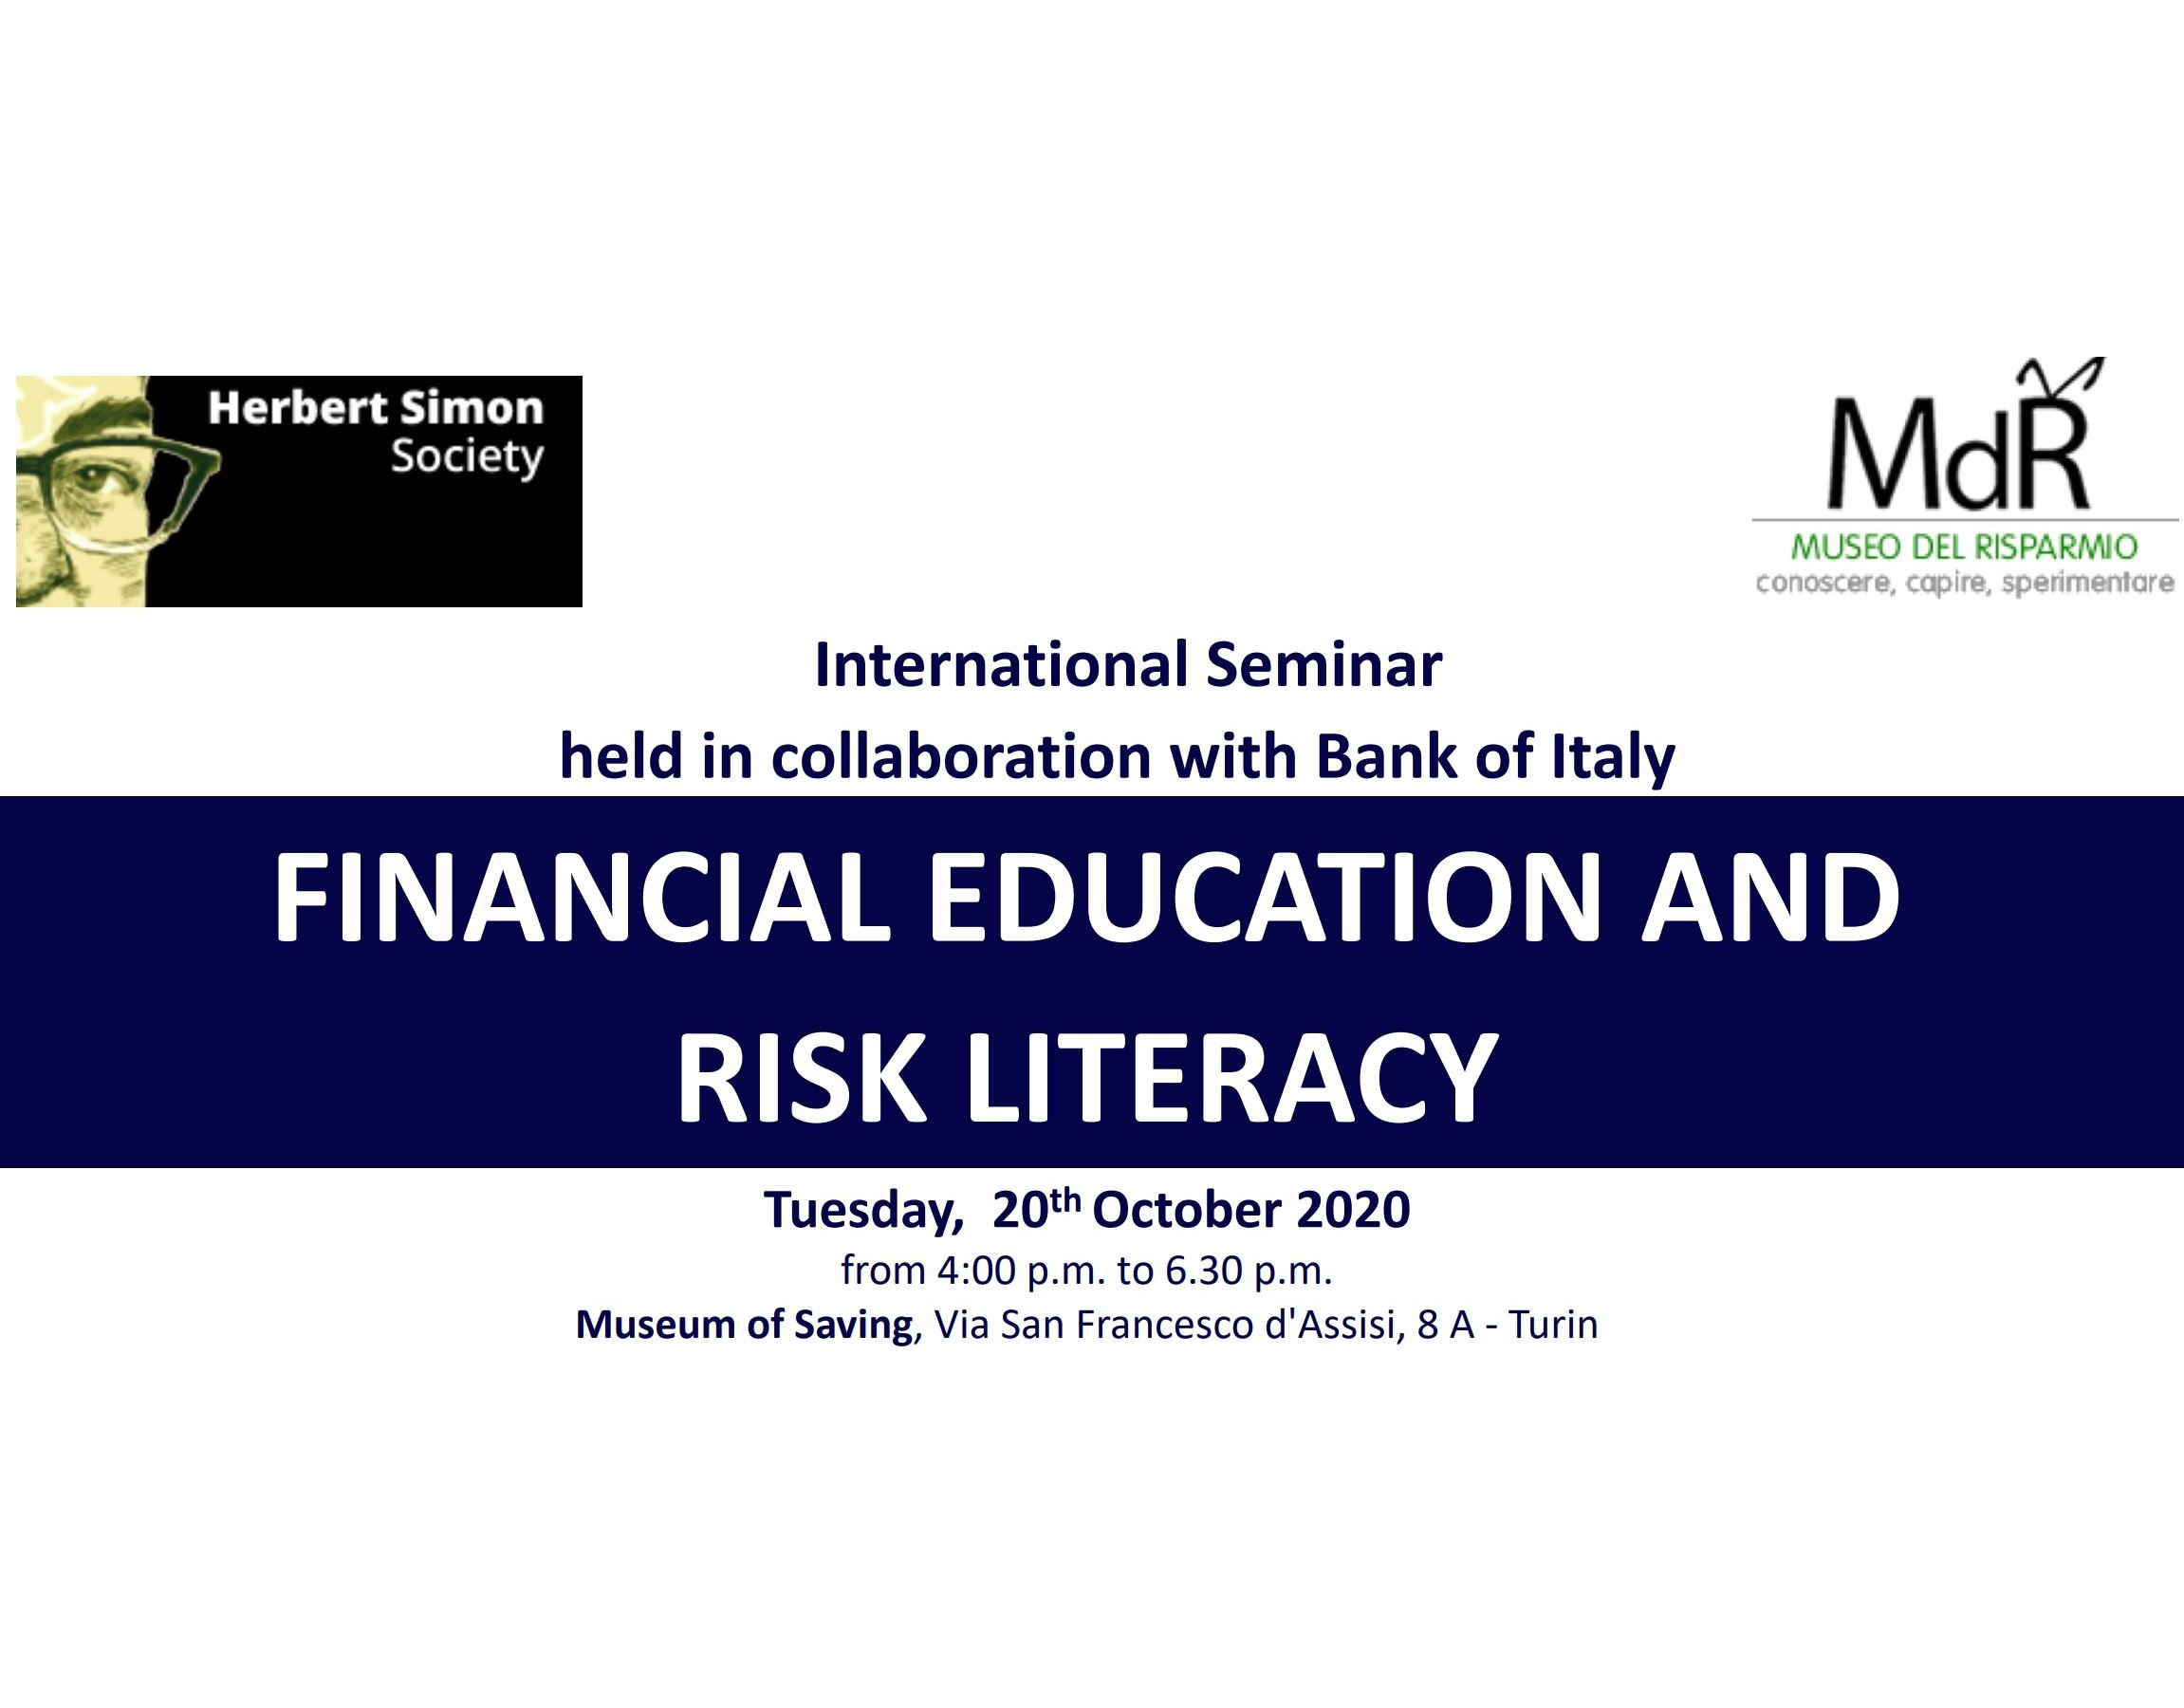 financial-education-risk-literacy